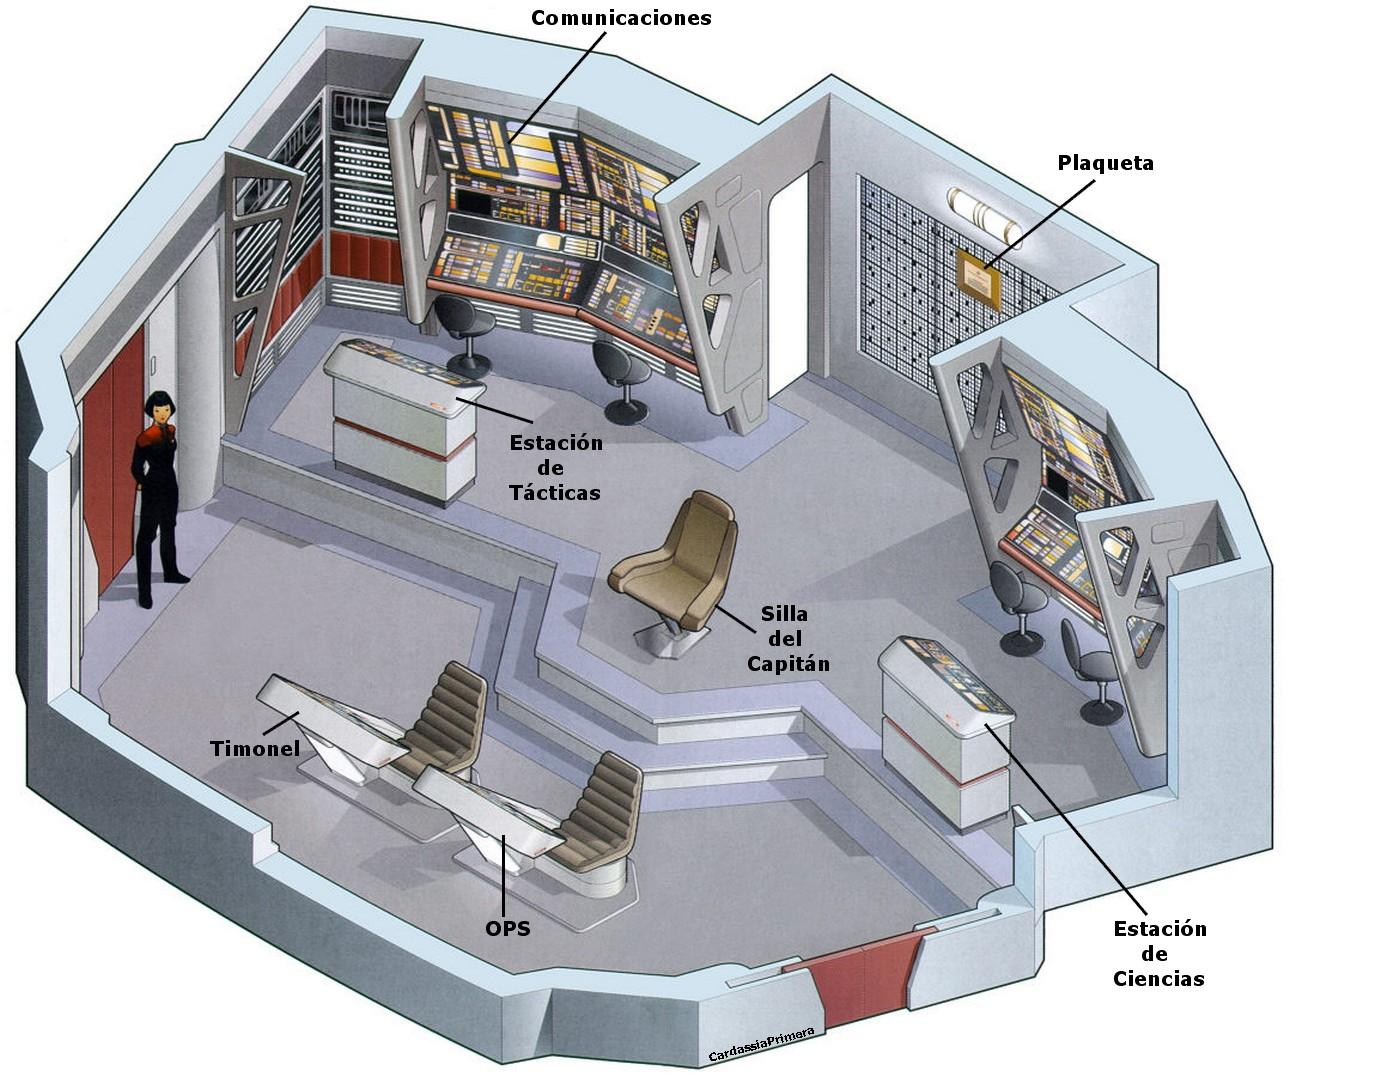 Star Trek Starships Bridges Interiors Schematics Blueprints Starship Schematics on